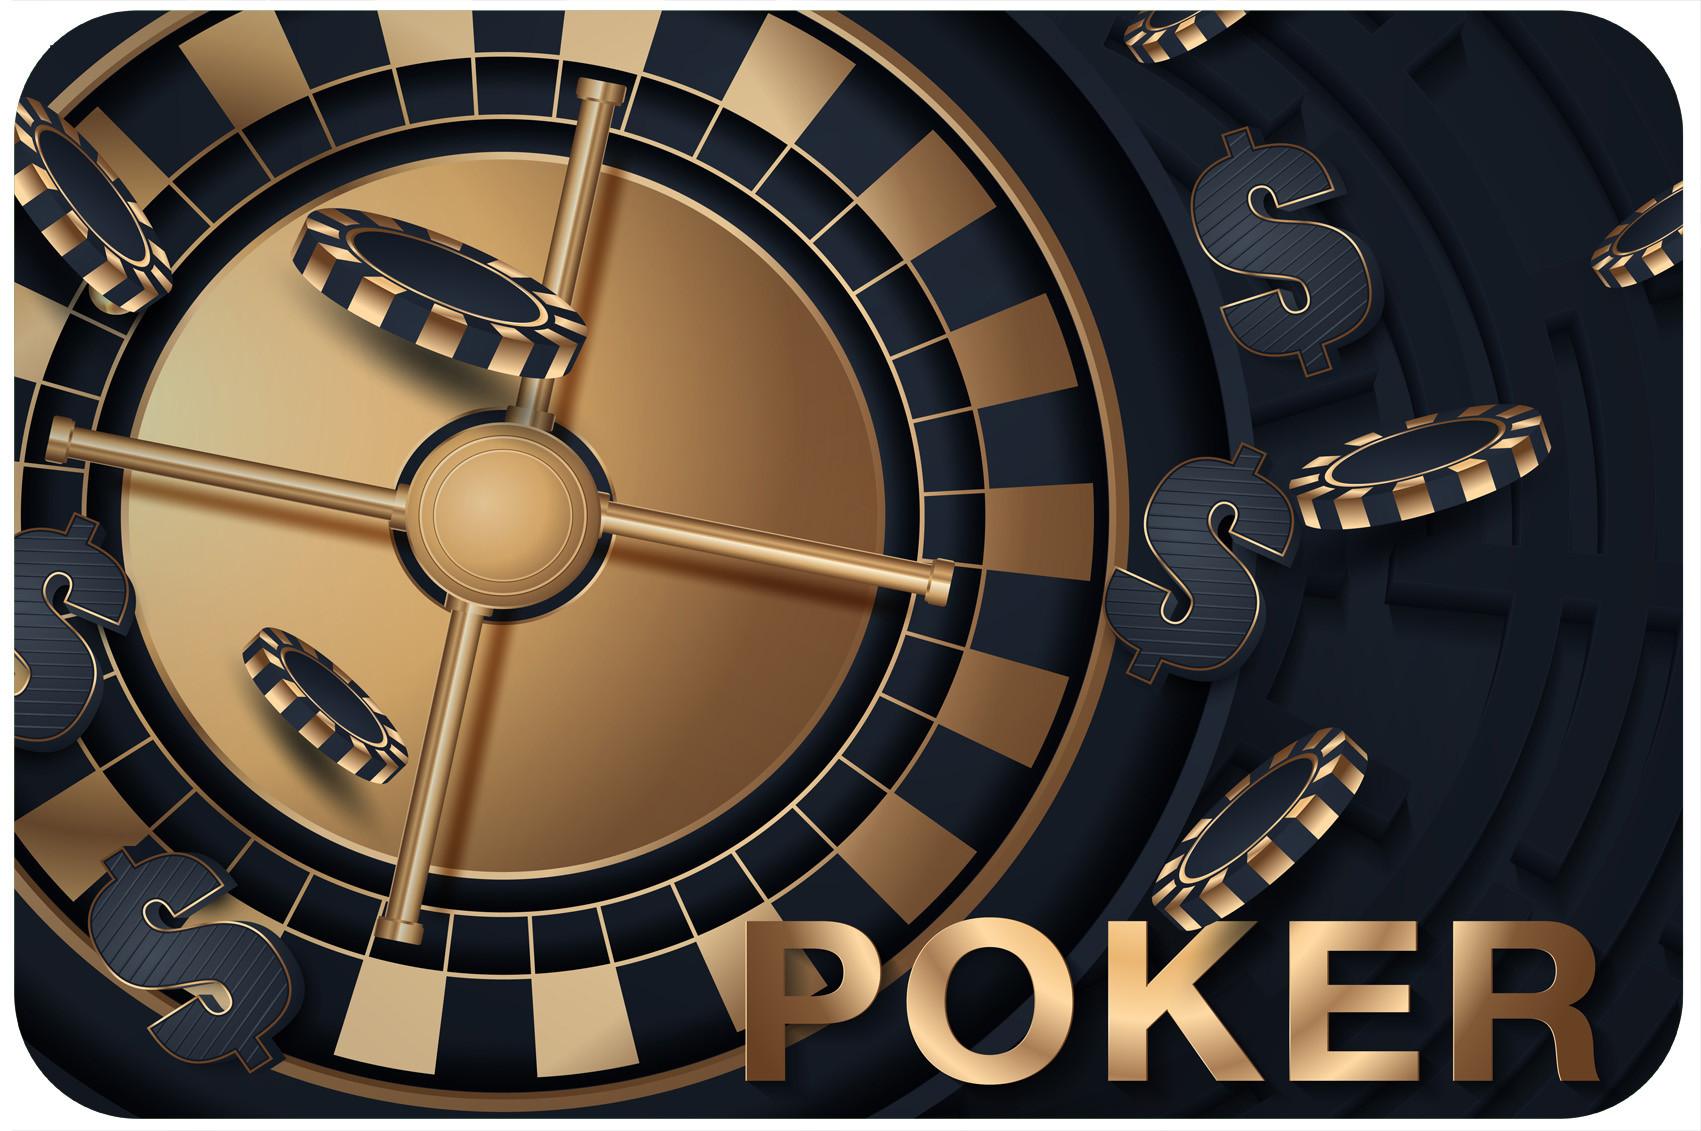 Tapis de poker personnalise